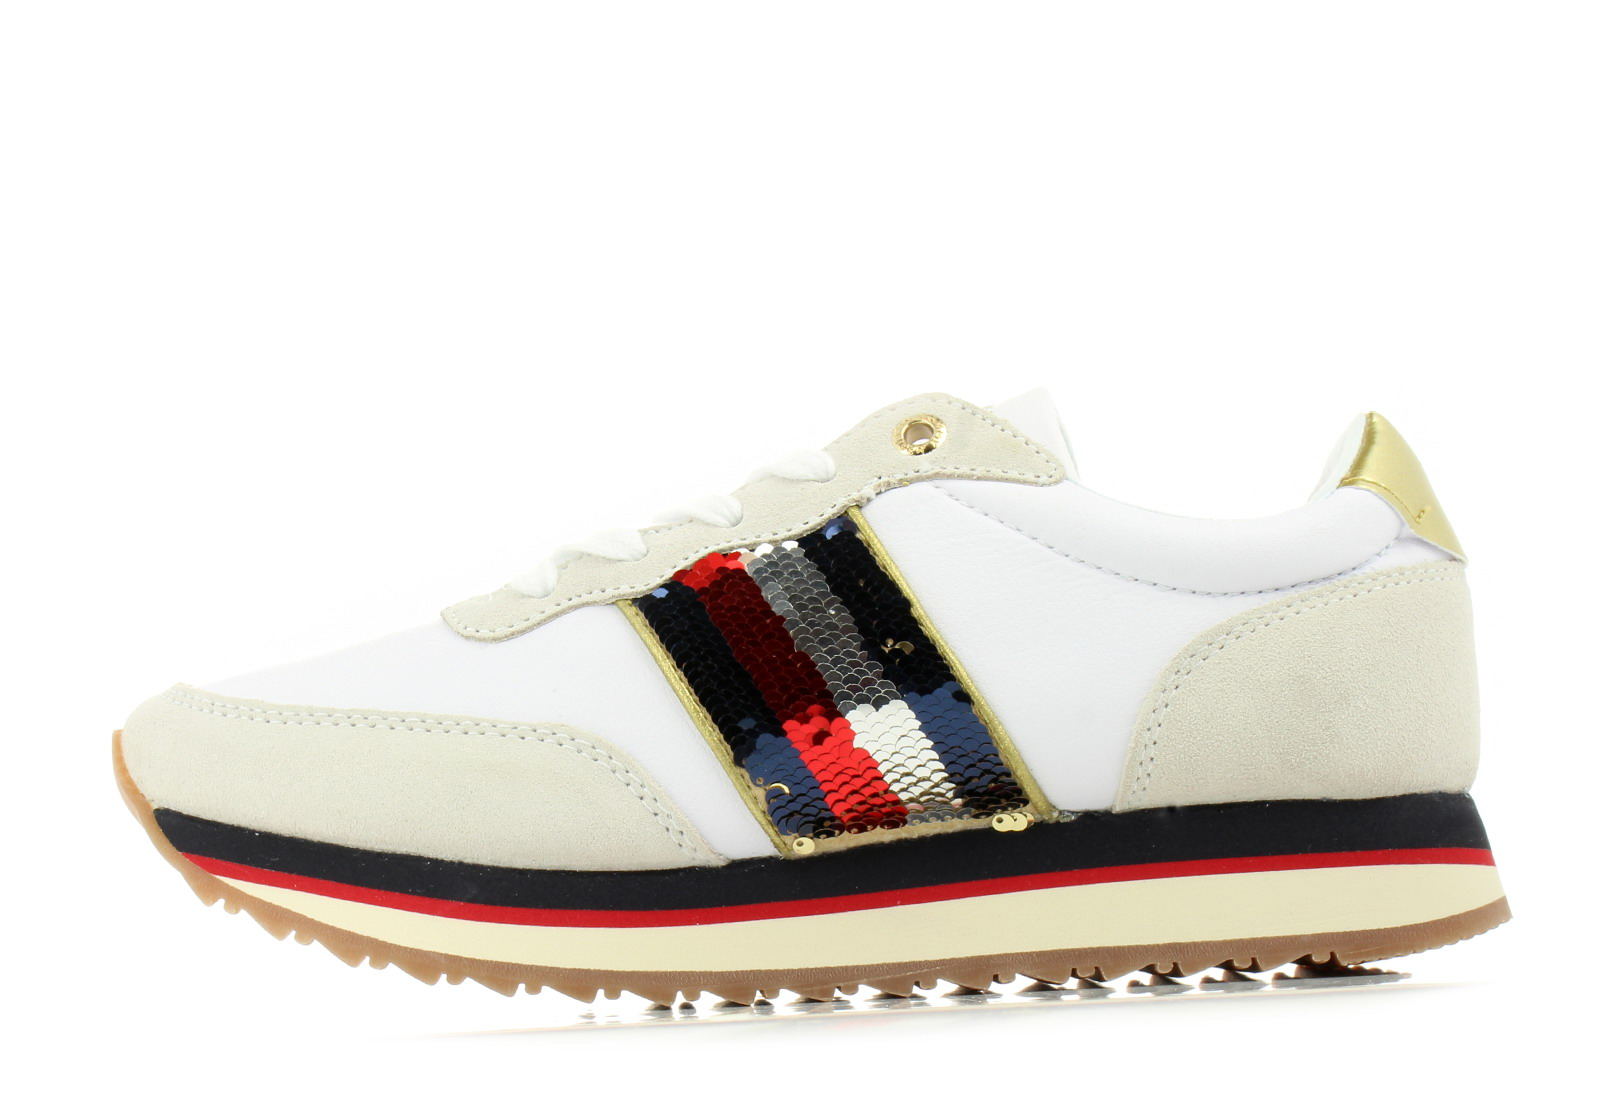 8c4621c697 Tommy Hilfiger Cipő - Angel 8c1 - 18H-3703-100 - Office Shoes ...